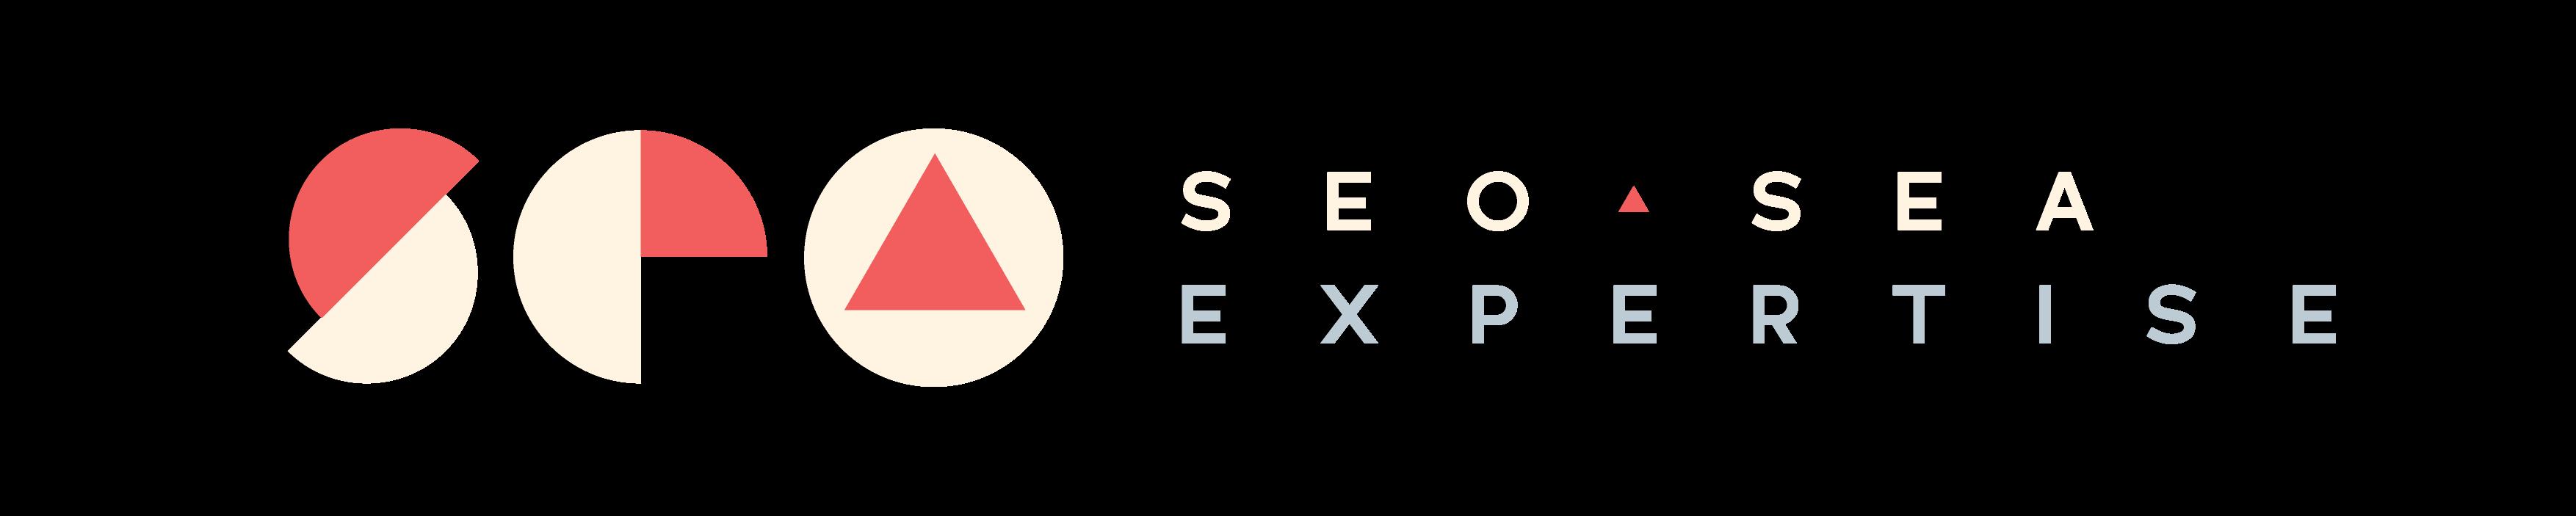 SEO SEA Expertise